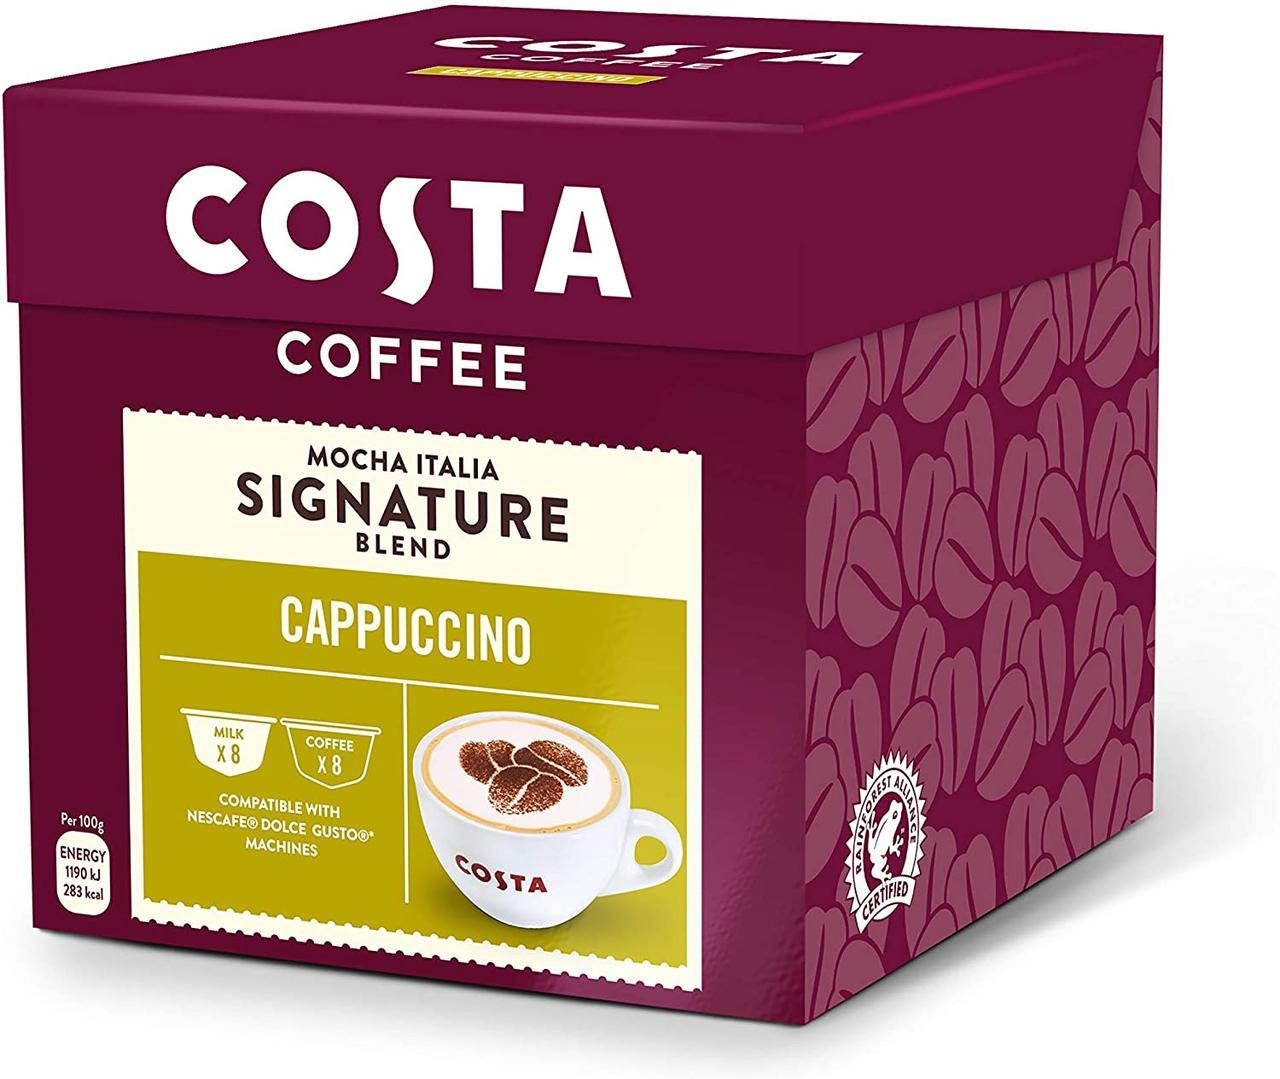 Dolce Gusto COSTA Cappuccino  - Дольче густо КОСТА Капучино   (16 капсул = 8 порций)